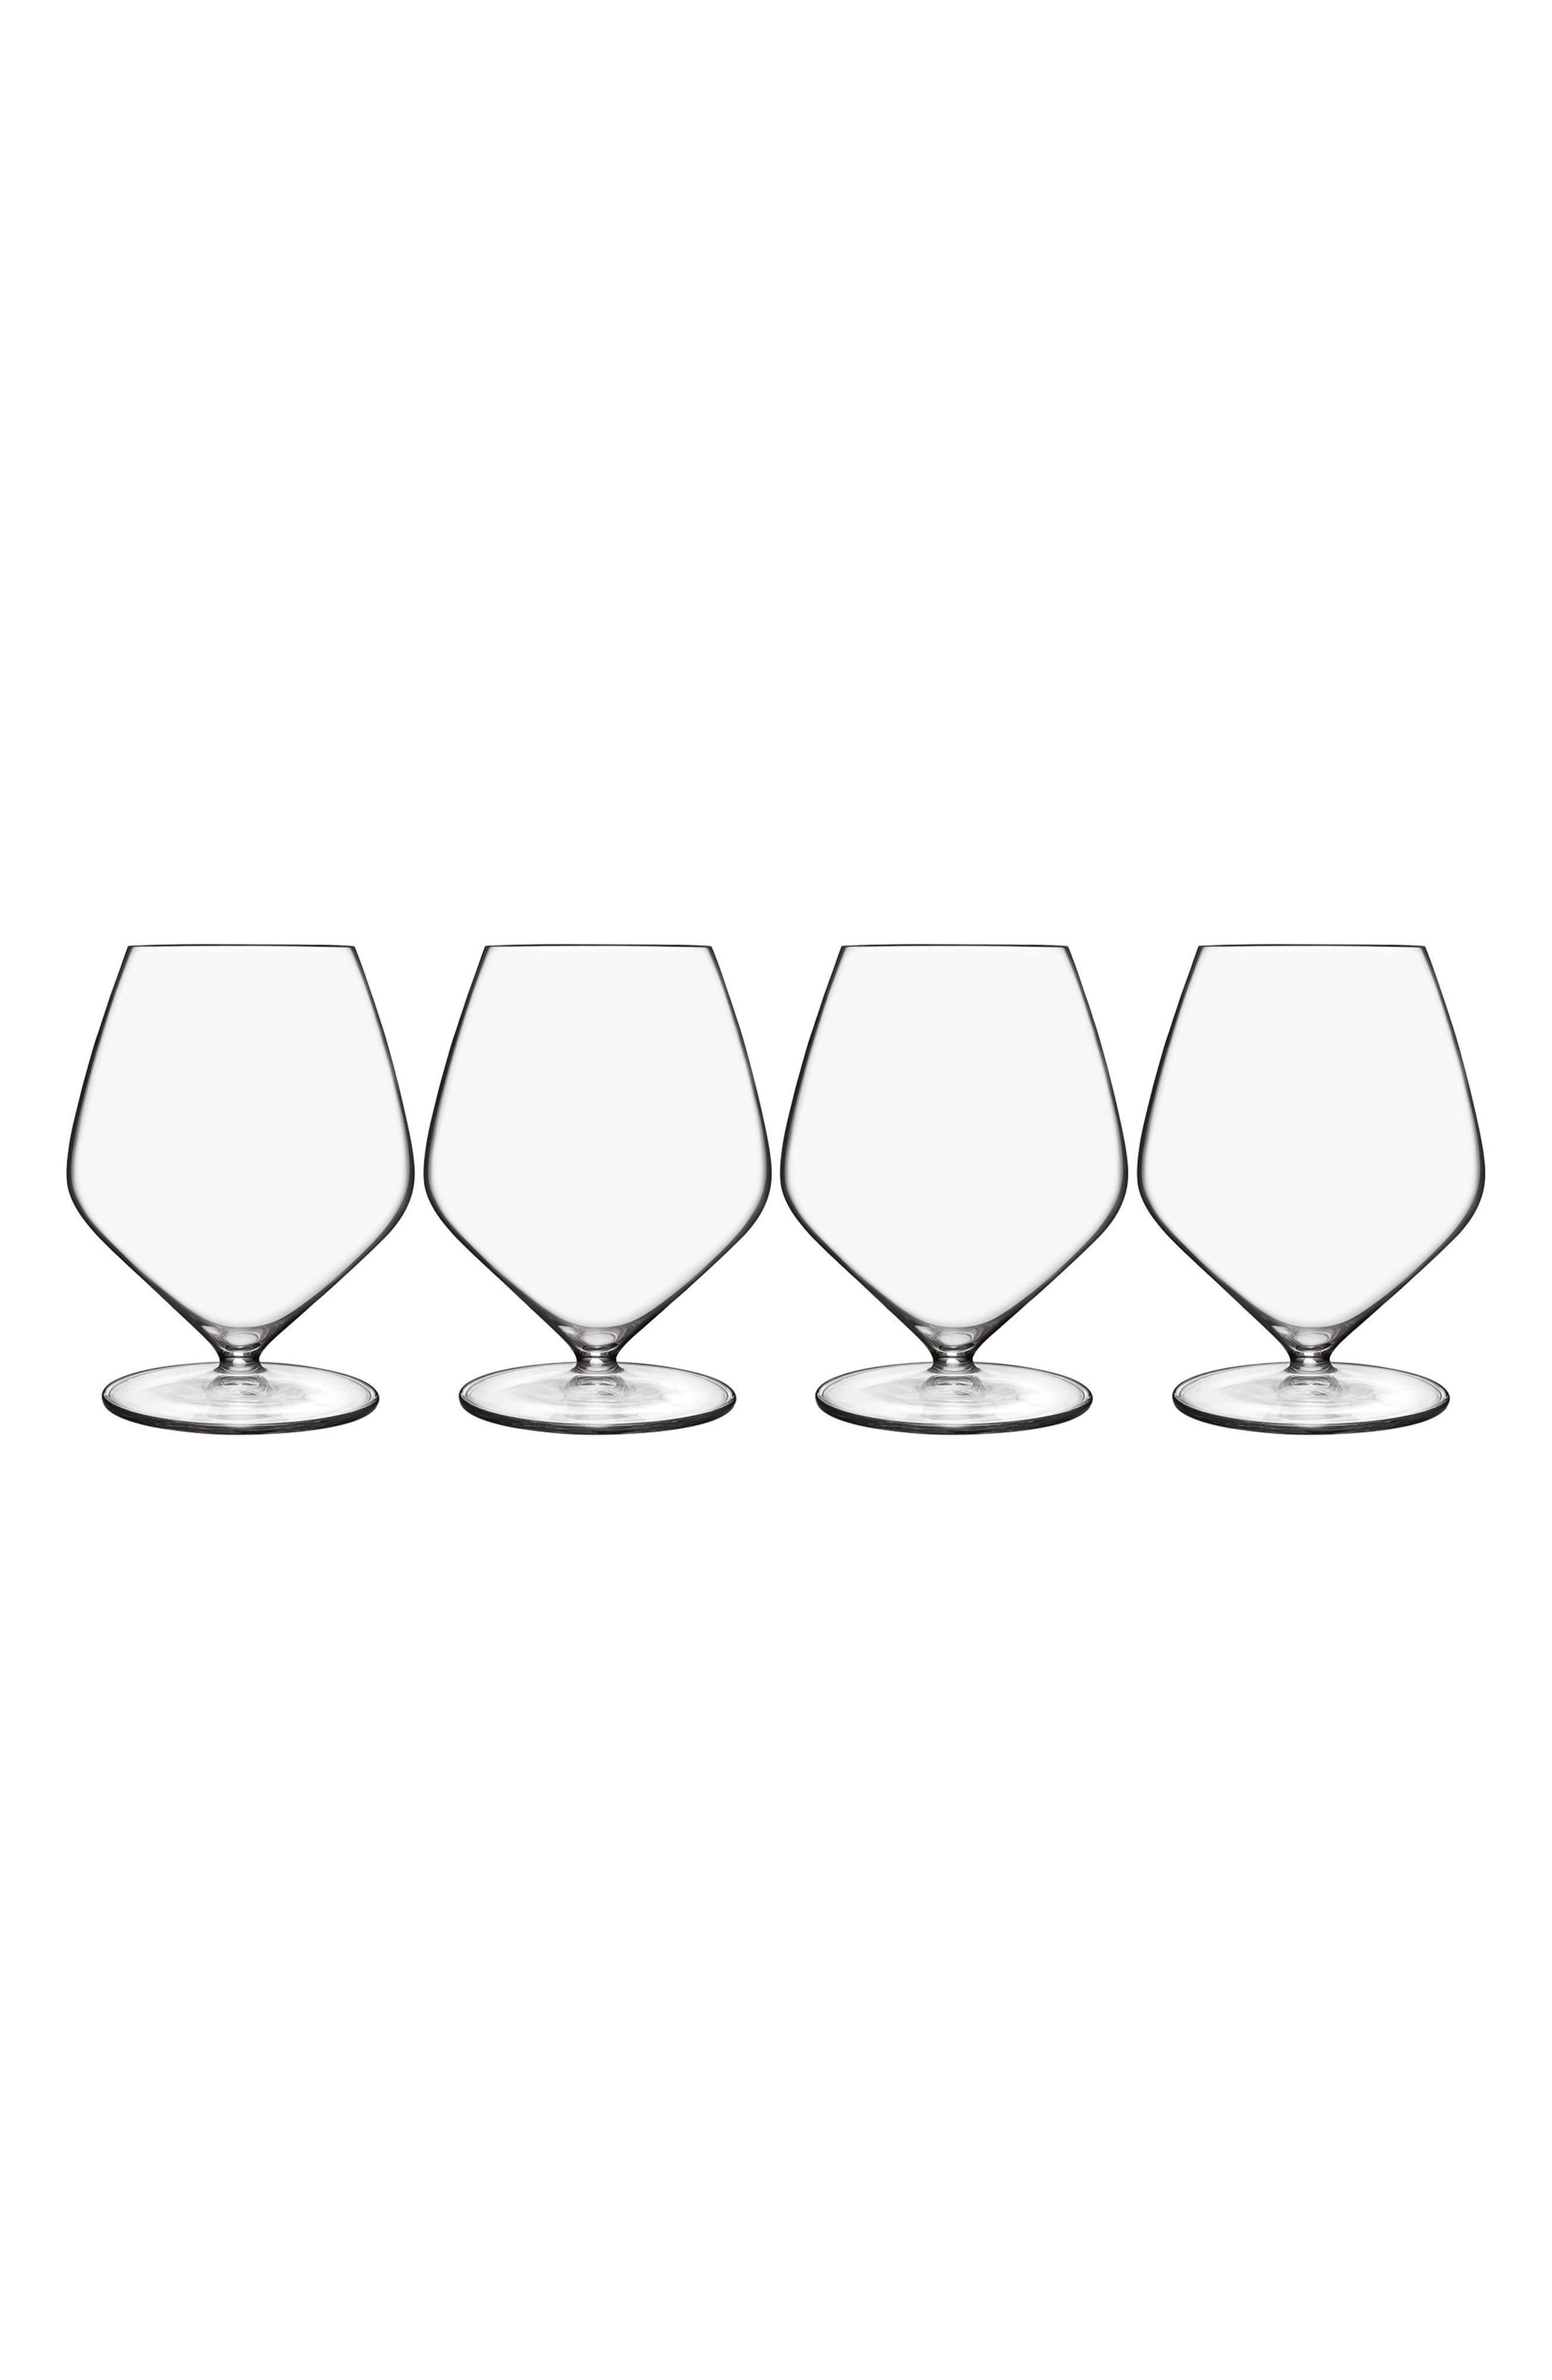 Main Image - Luigi Bormioli T-Glass Set of 4 Pinot Noir Glasses